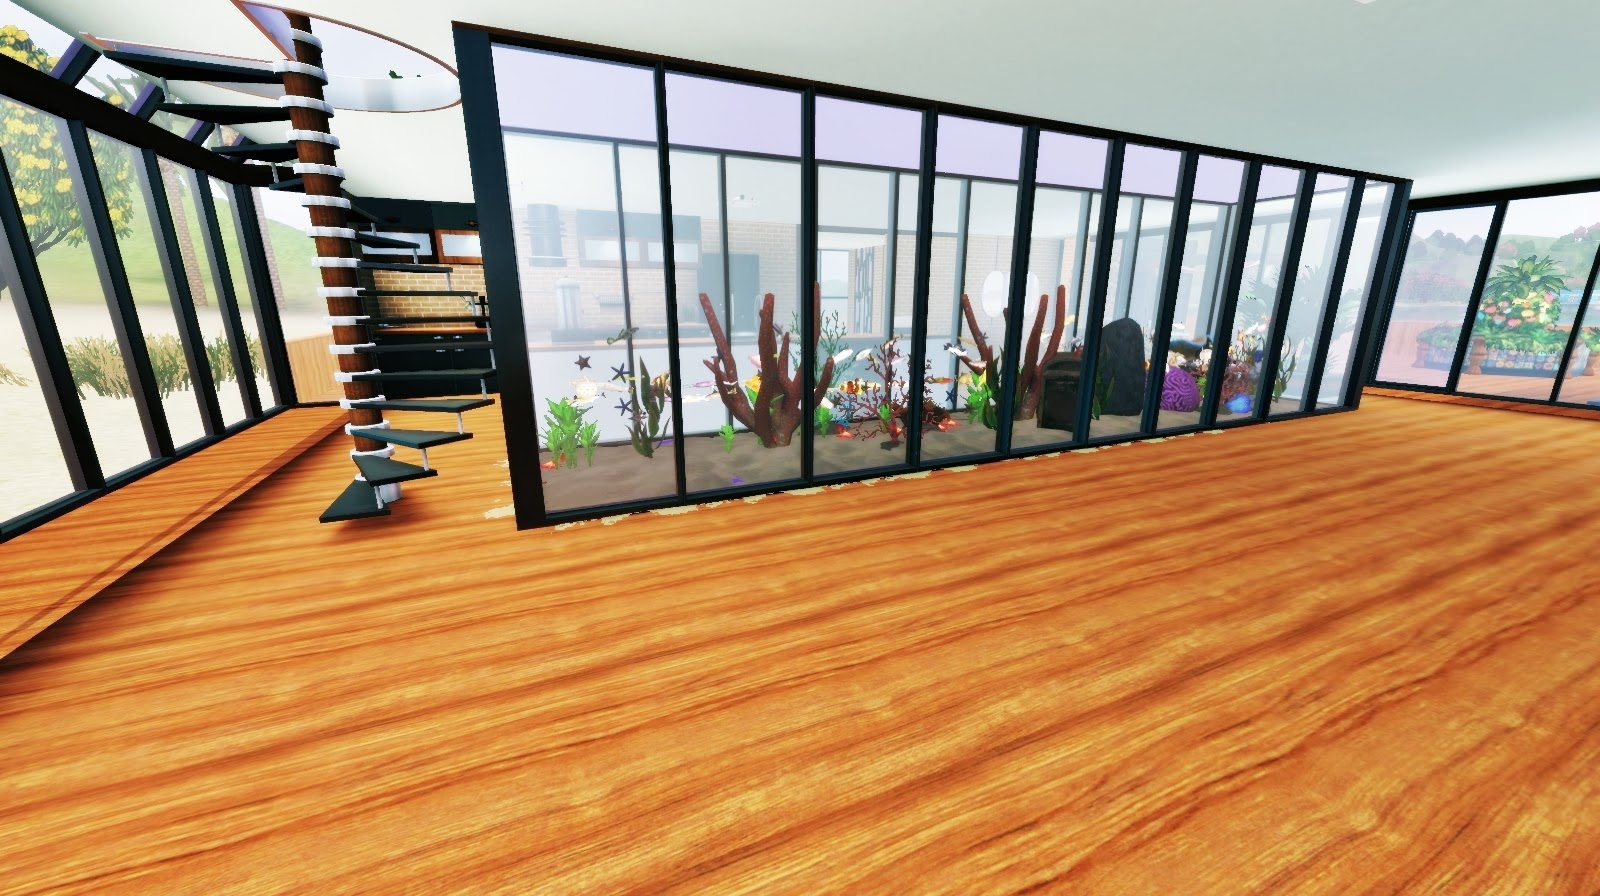 My sims 3 blog modern beach house by skyfallsims for Beach house designs for sims 3